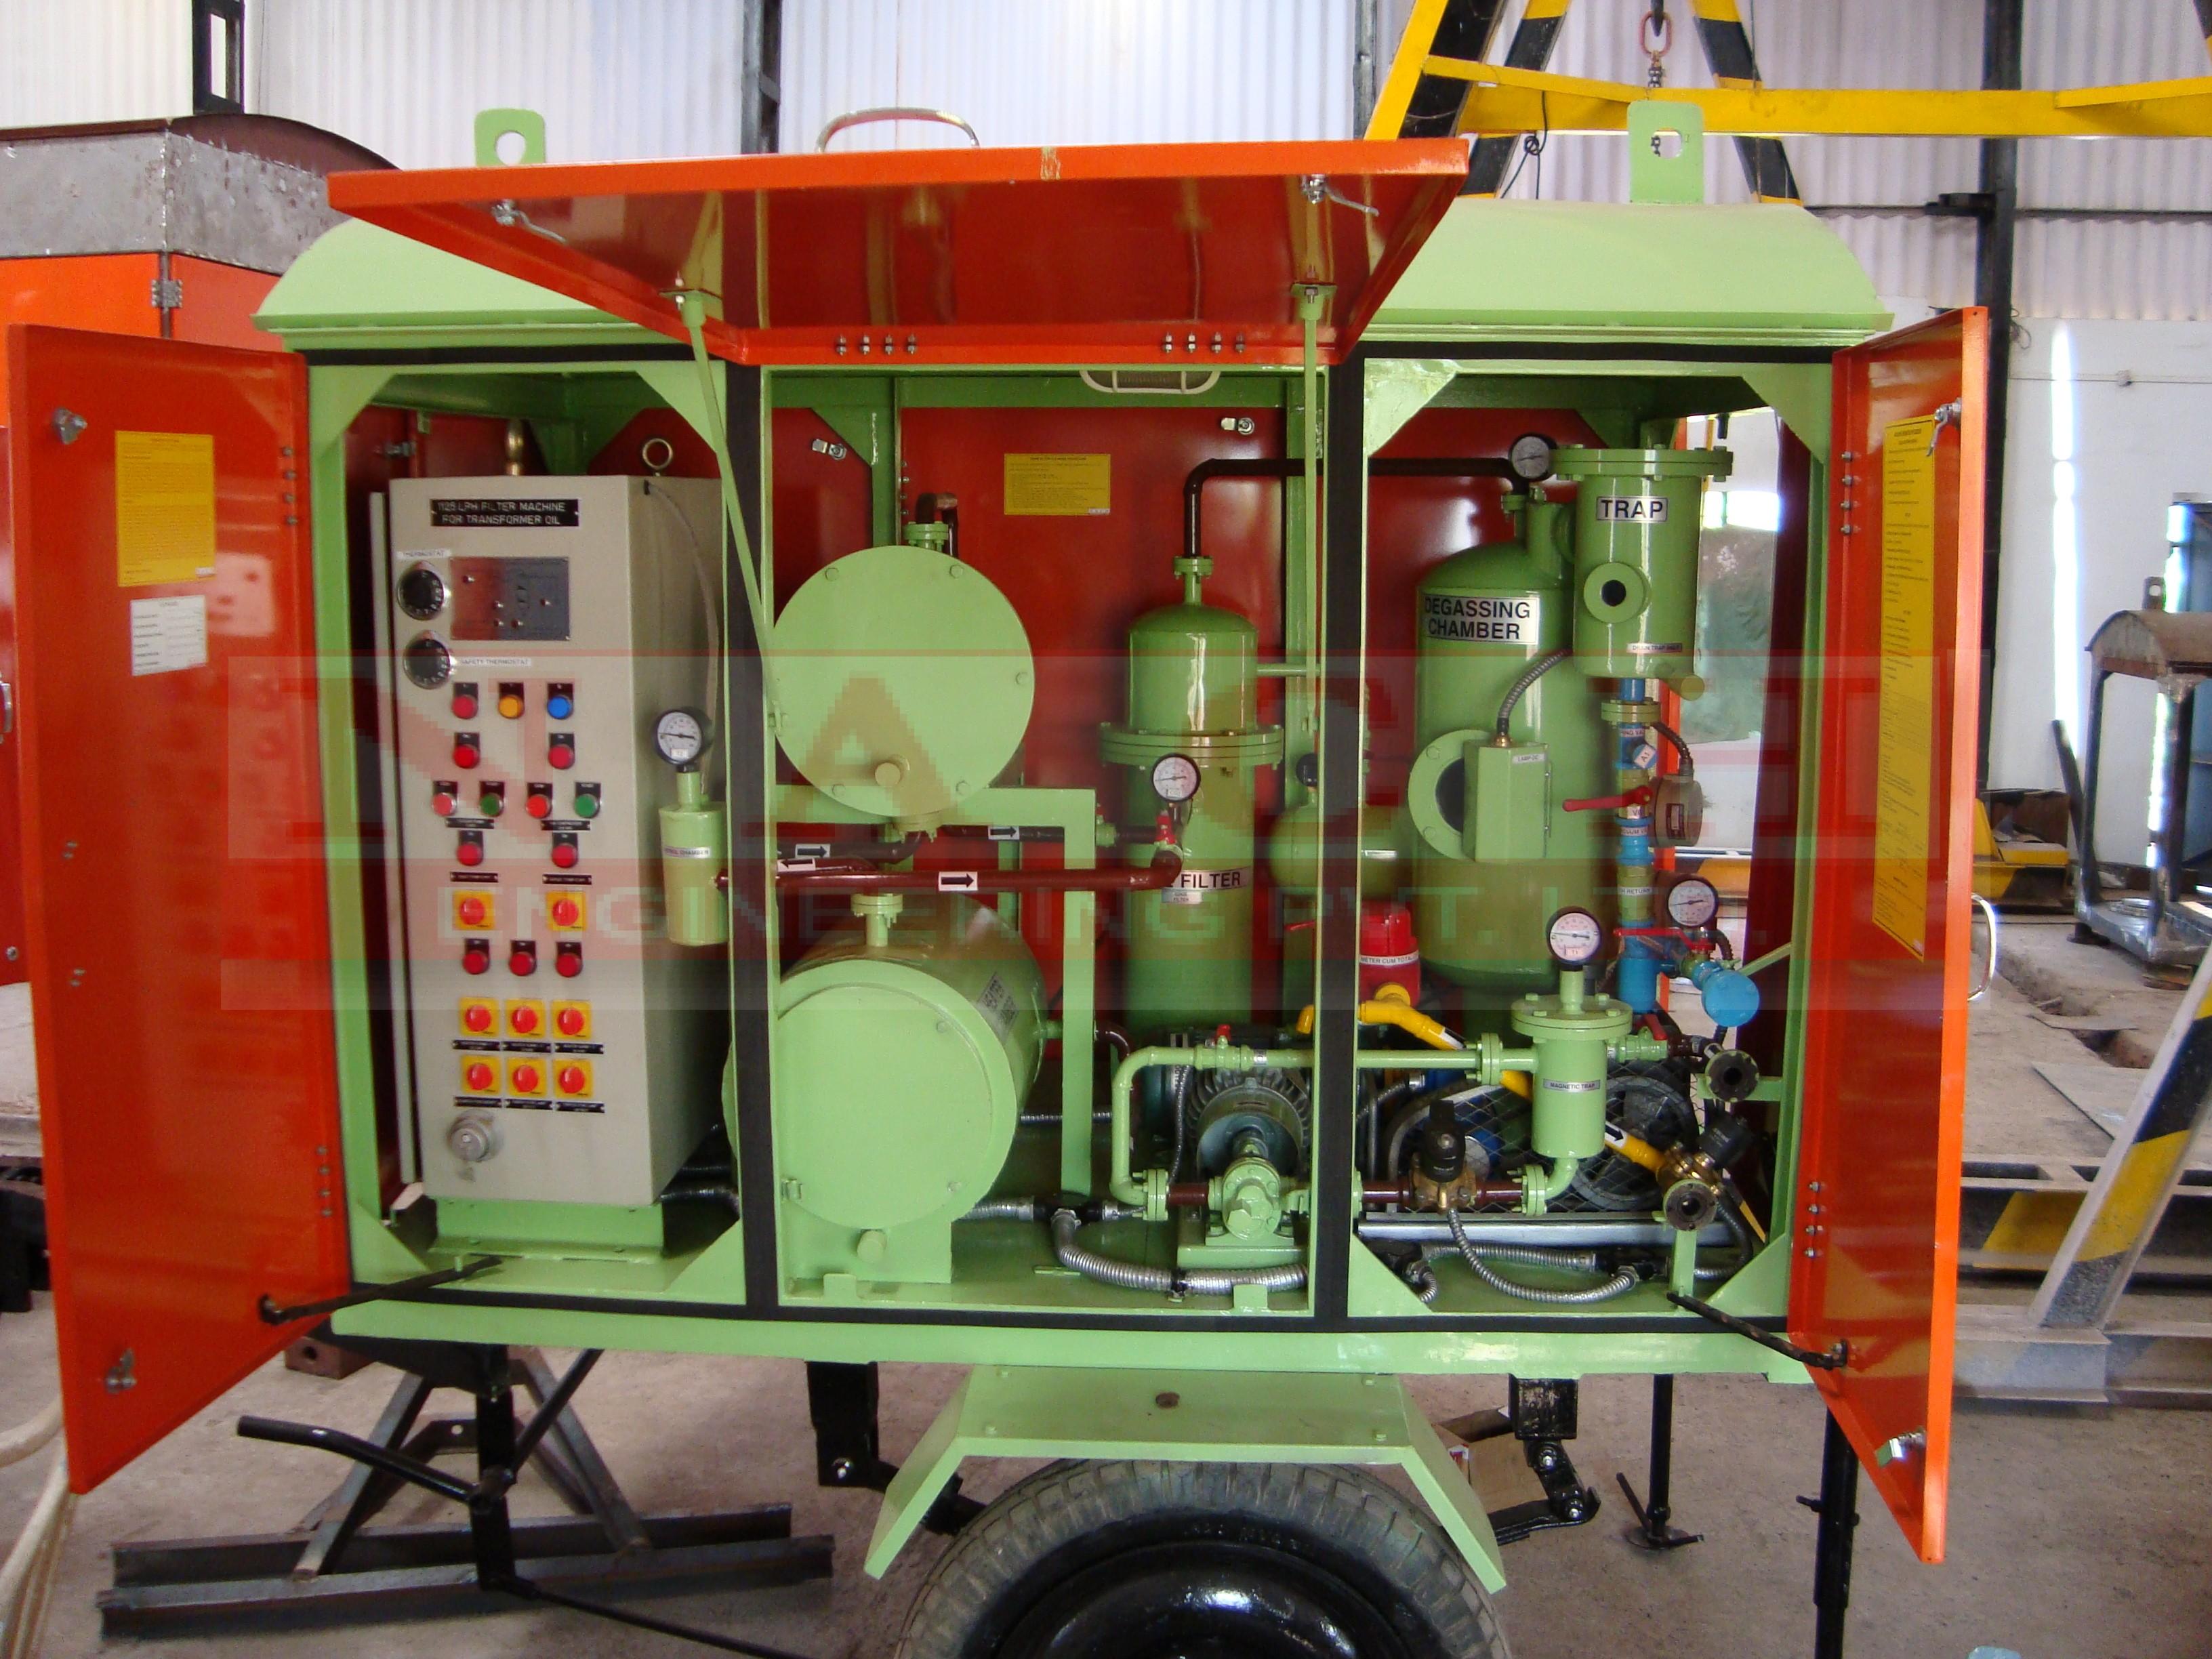 Transformer Oil Purification / filtration Process/Procedure ? - NACH